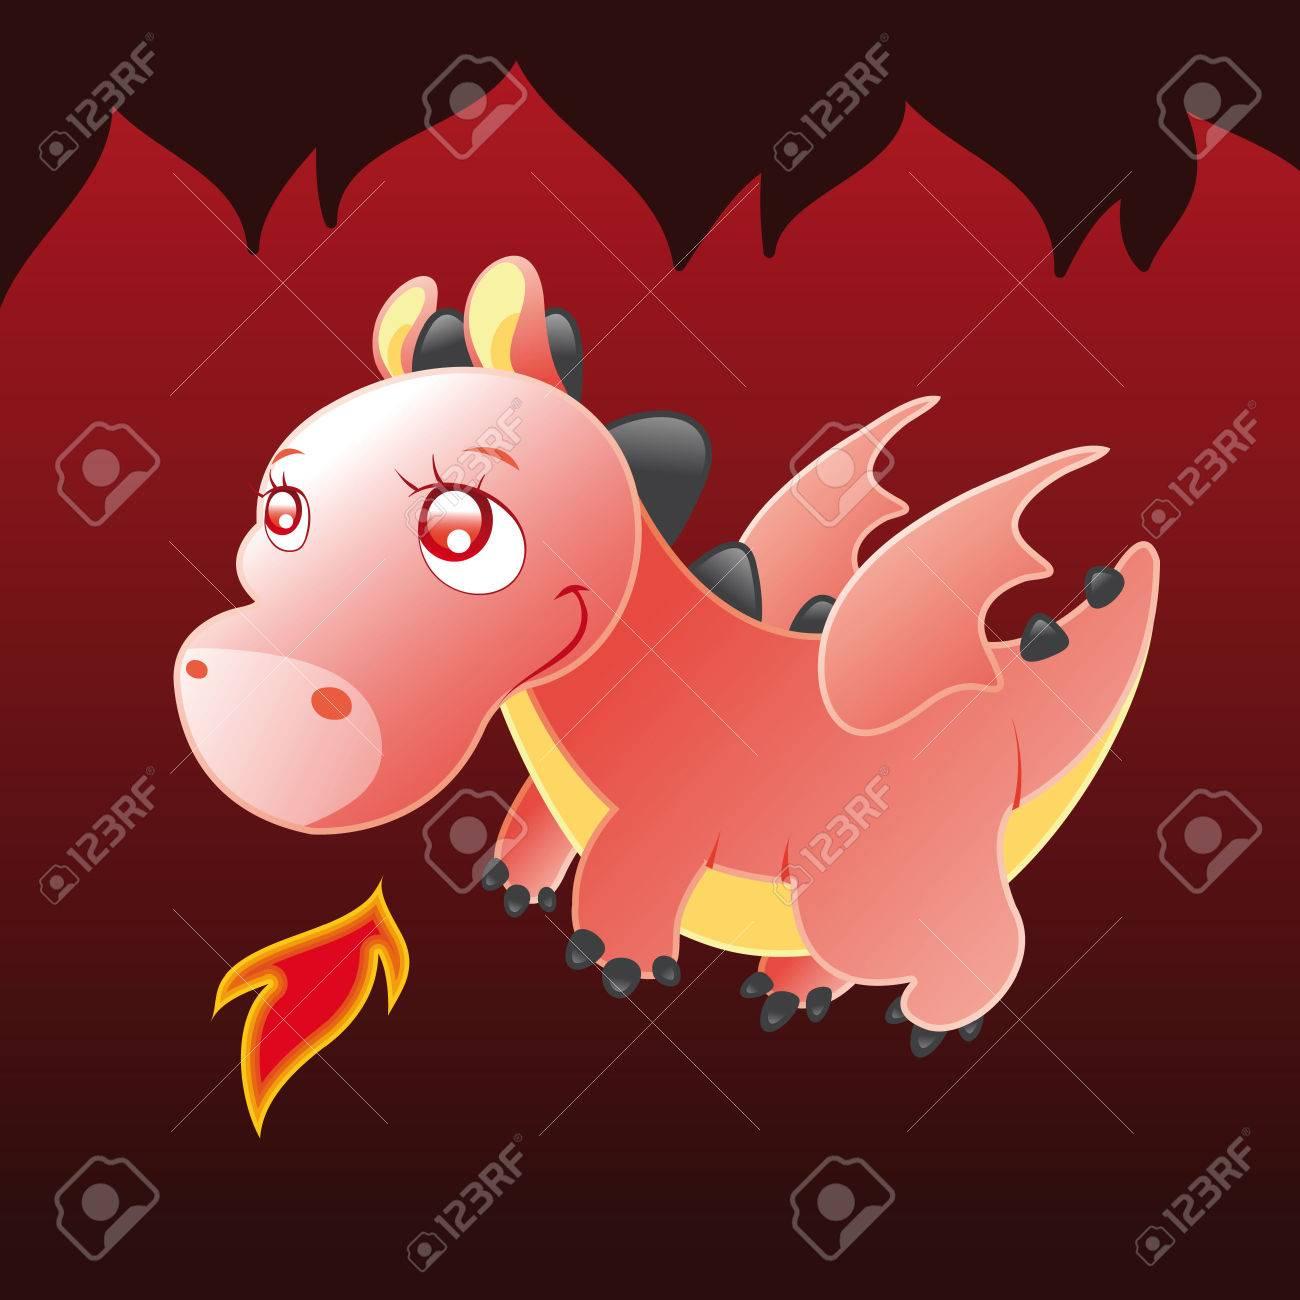 Little Dragon. Cartoon and vector illustration. Stock Vector - 5877597